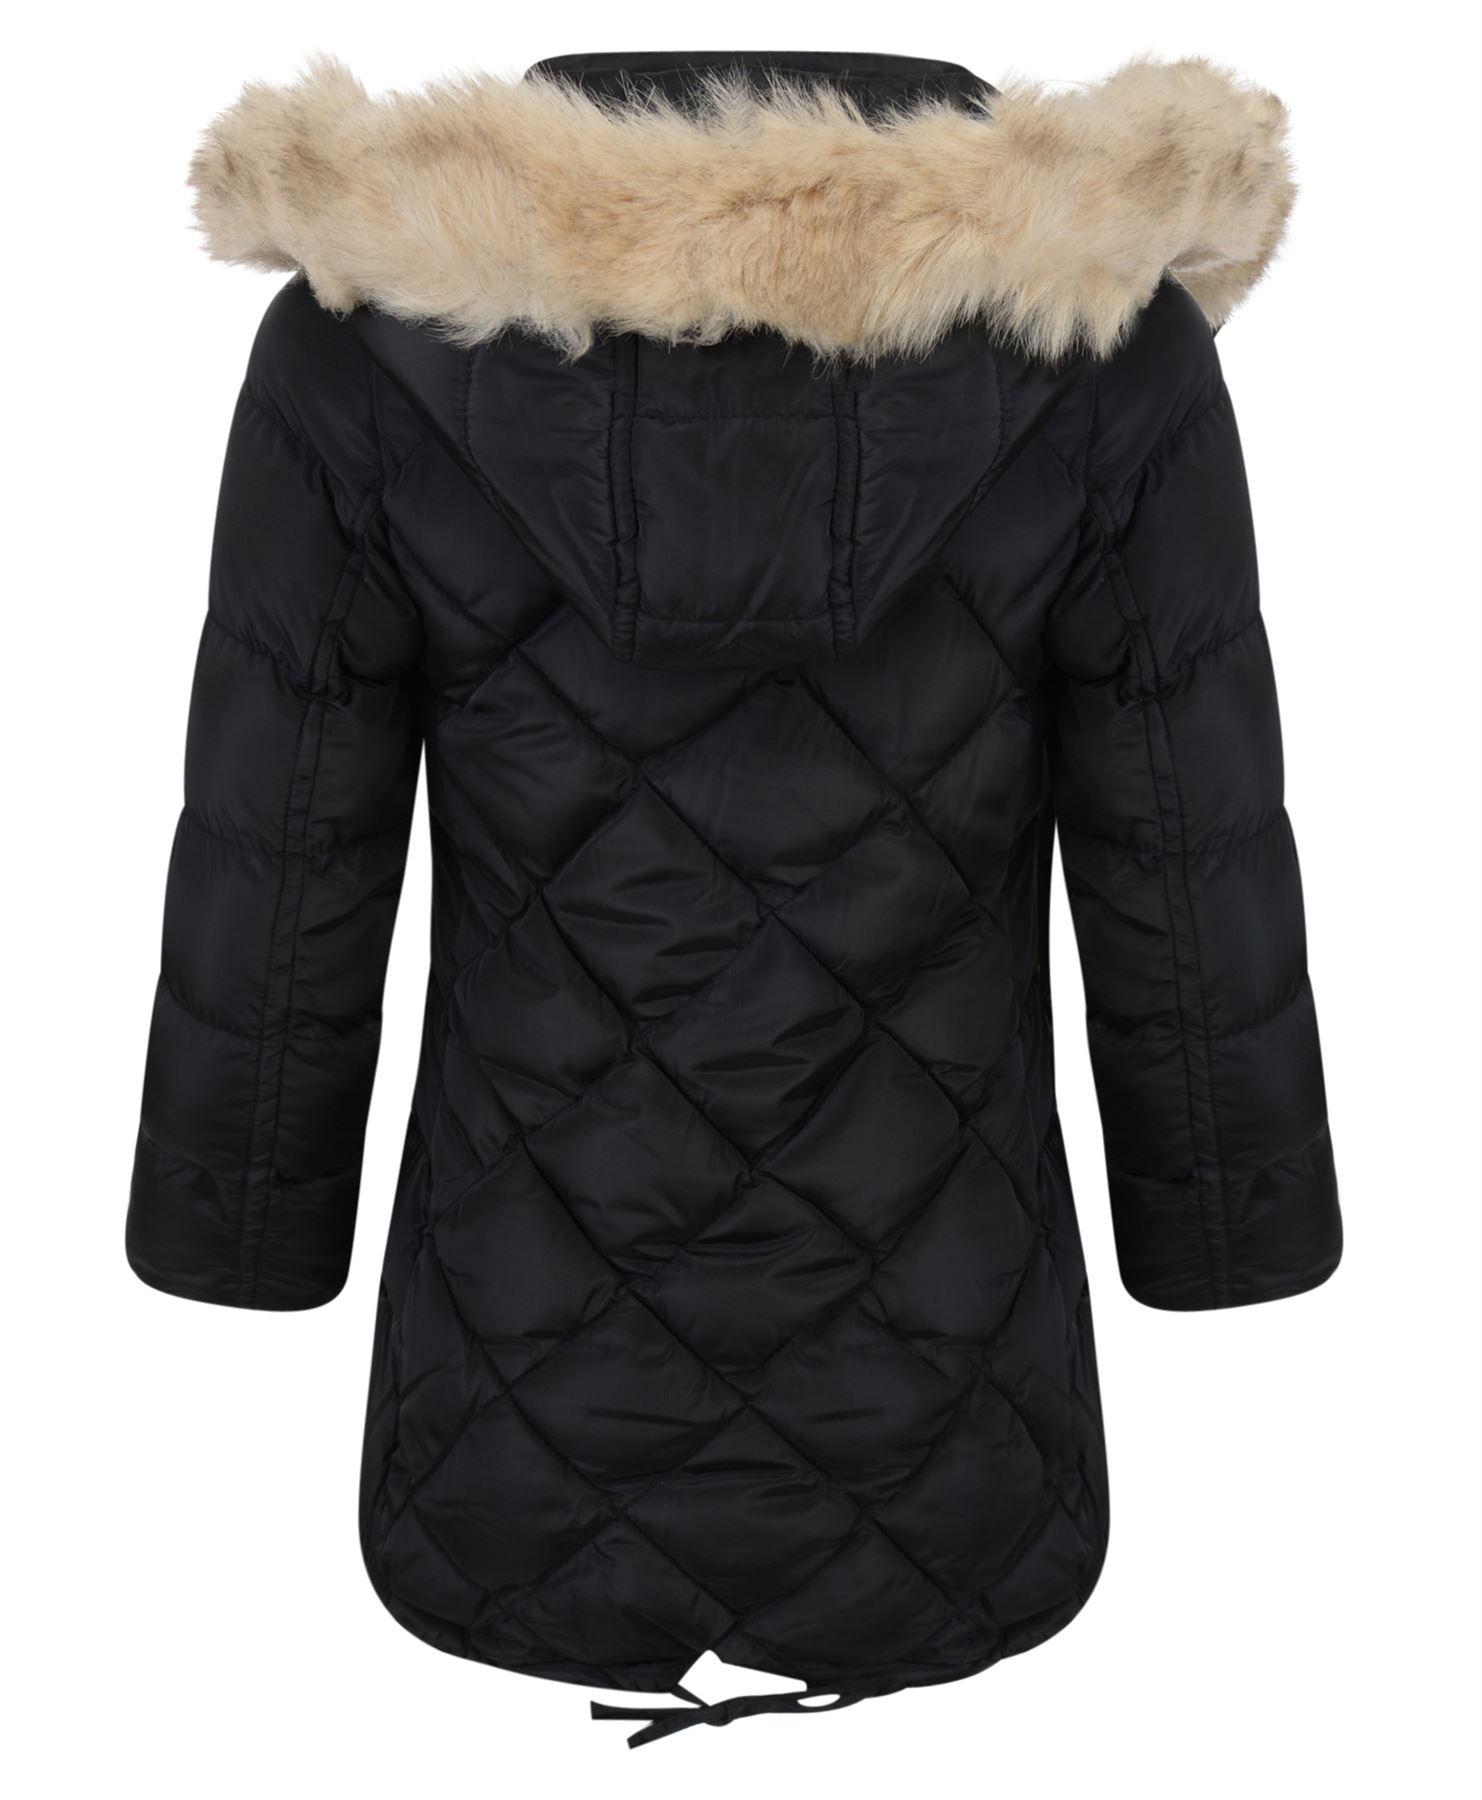 girls long down quilted winter parka jacket kids detach hood zip coat 3 14 years ebay. Black Bedroom Furniture Sets. Home Design Ideas